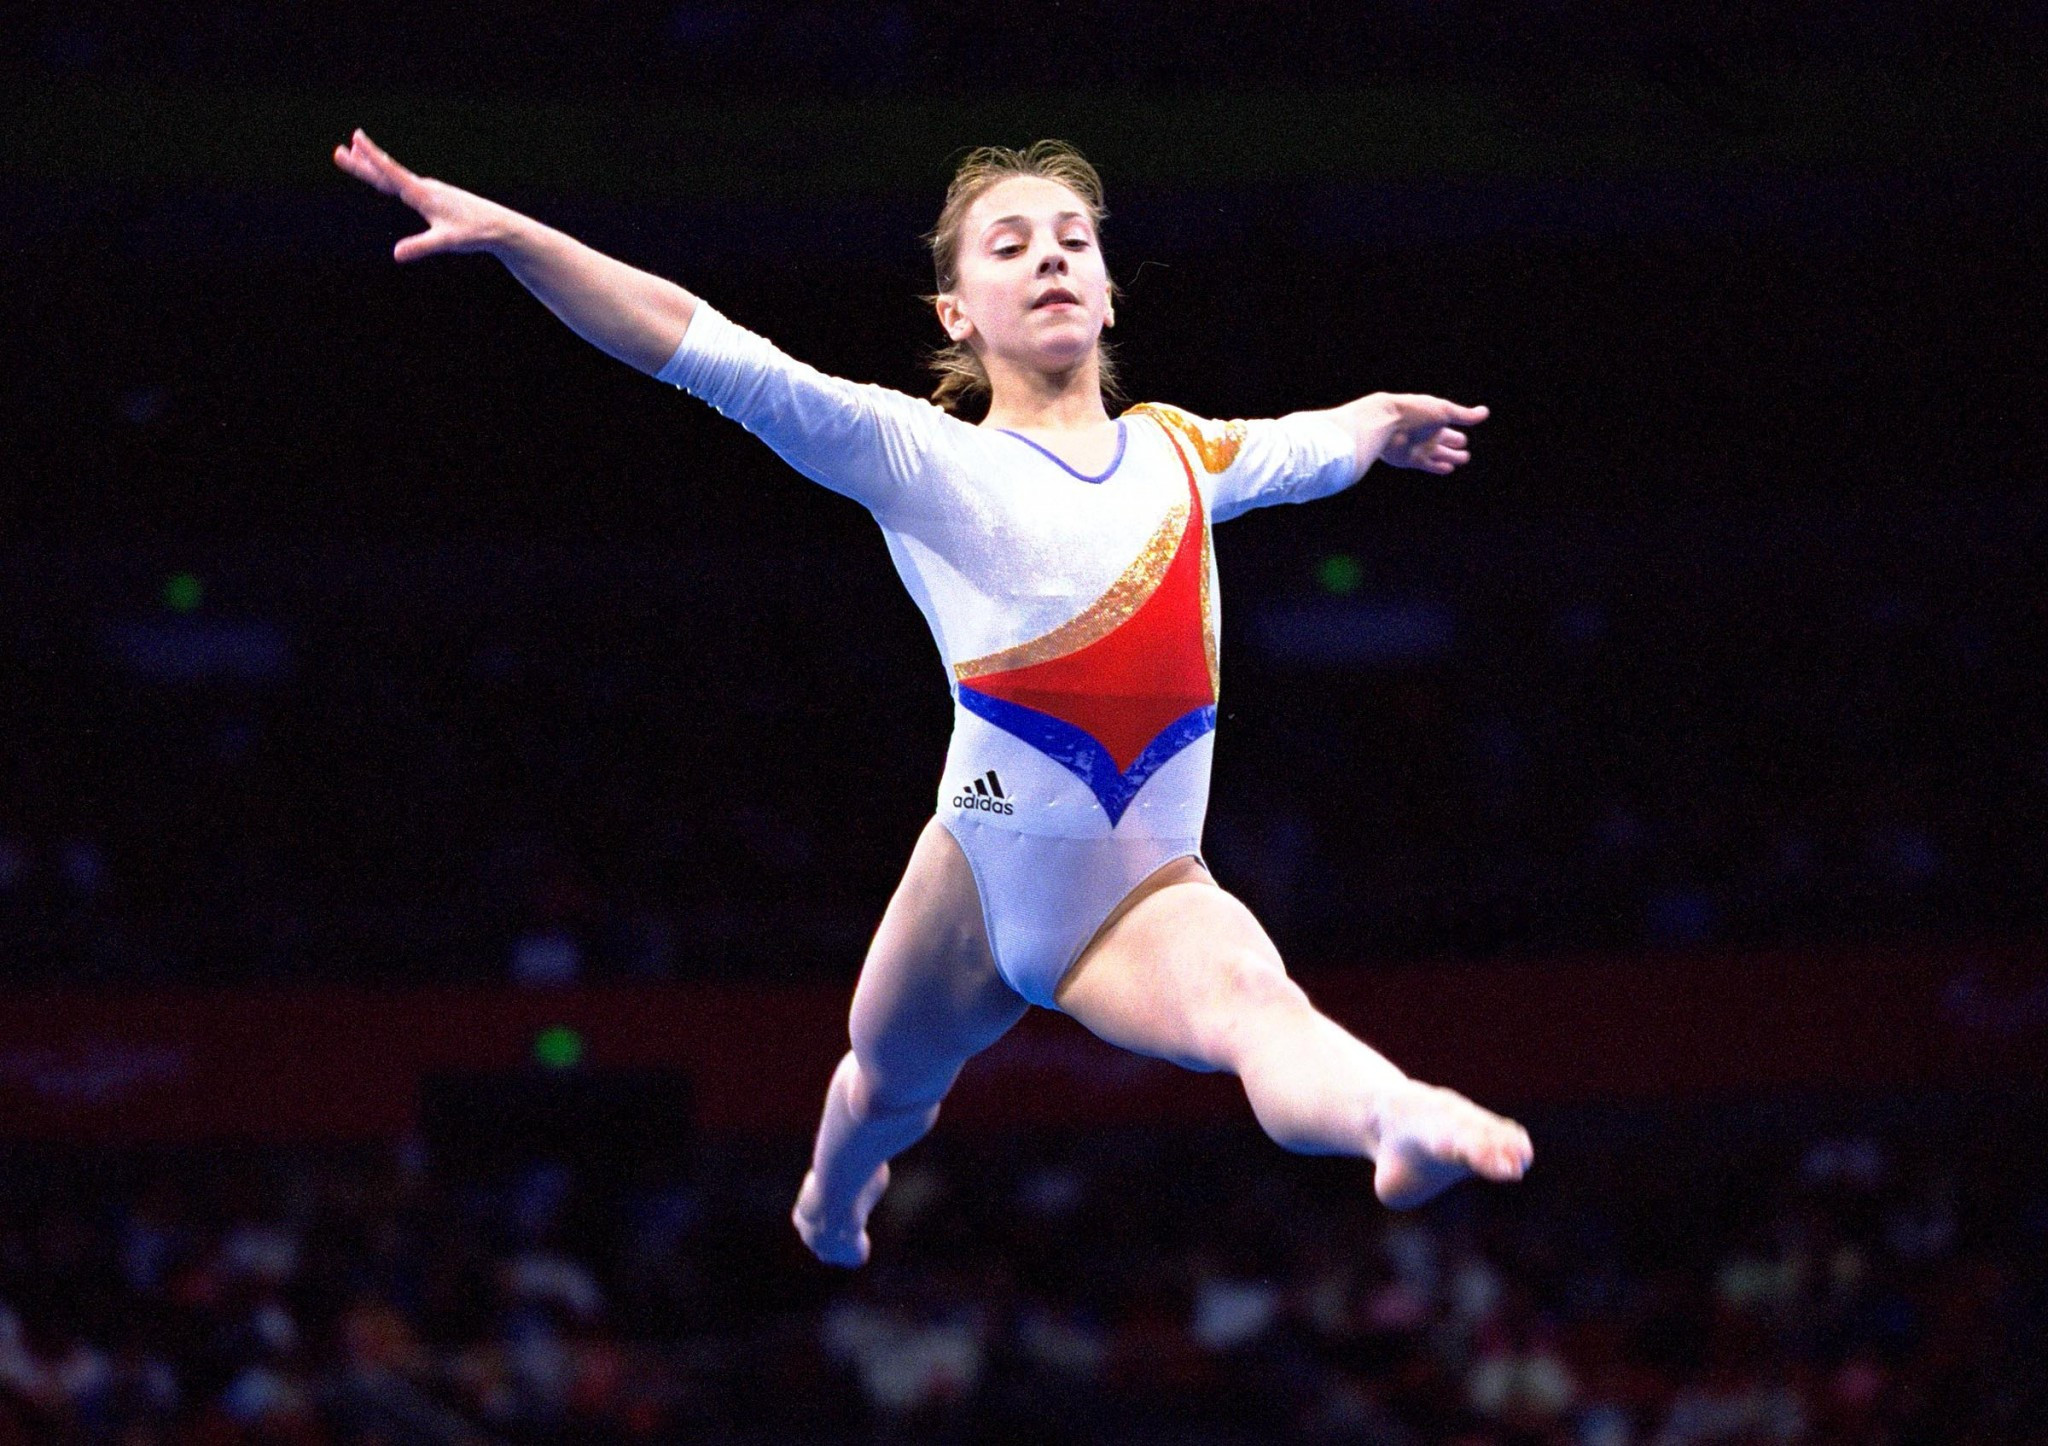 Sydney 2000 Olympic Medallion Gymnastics